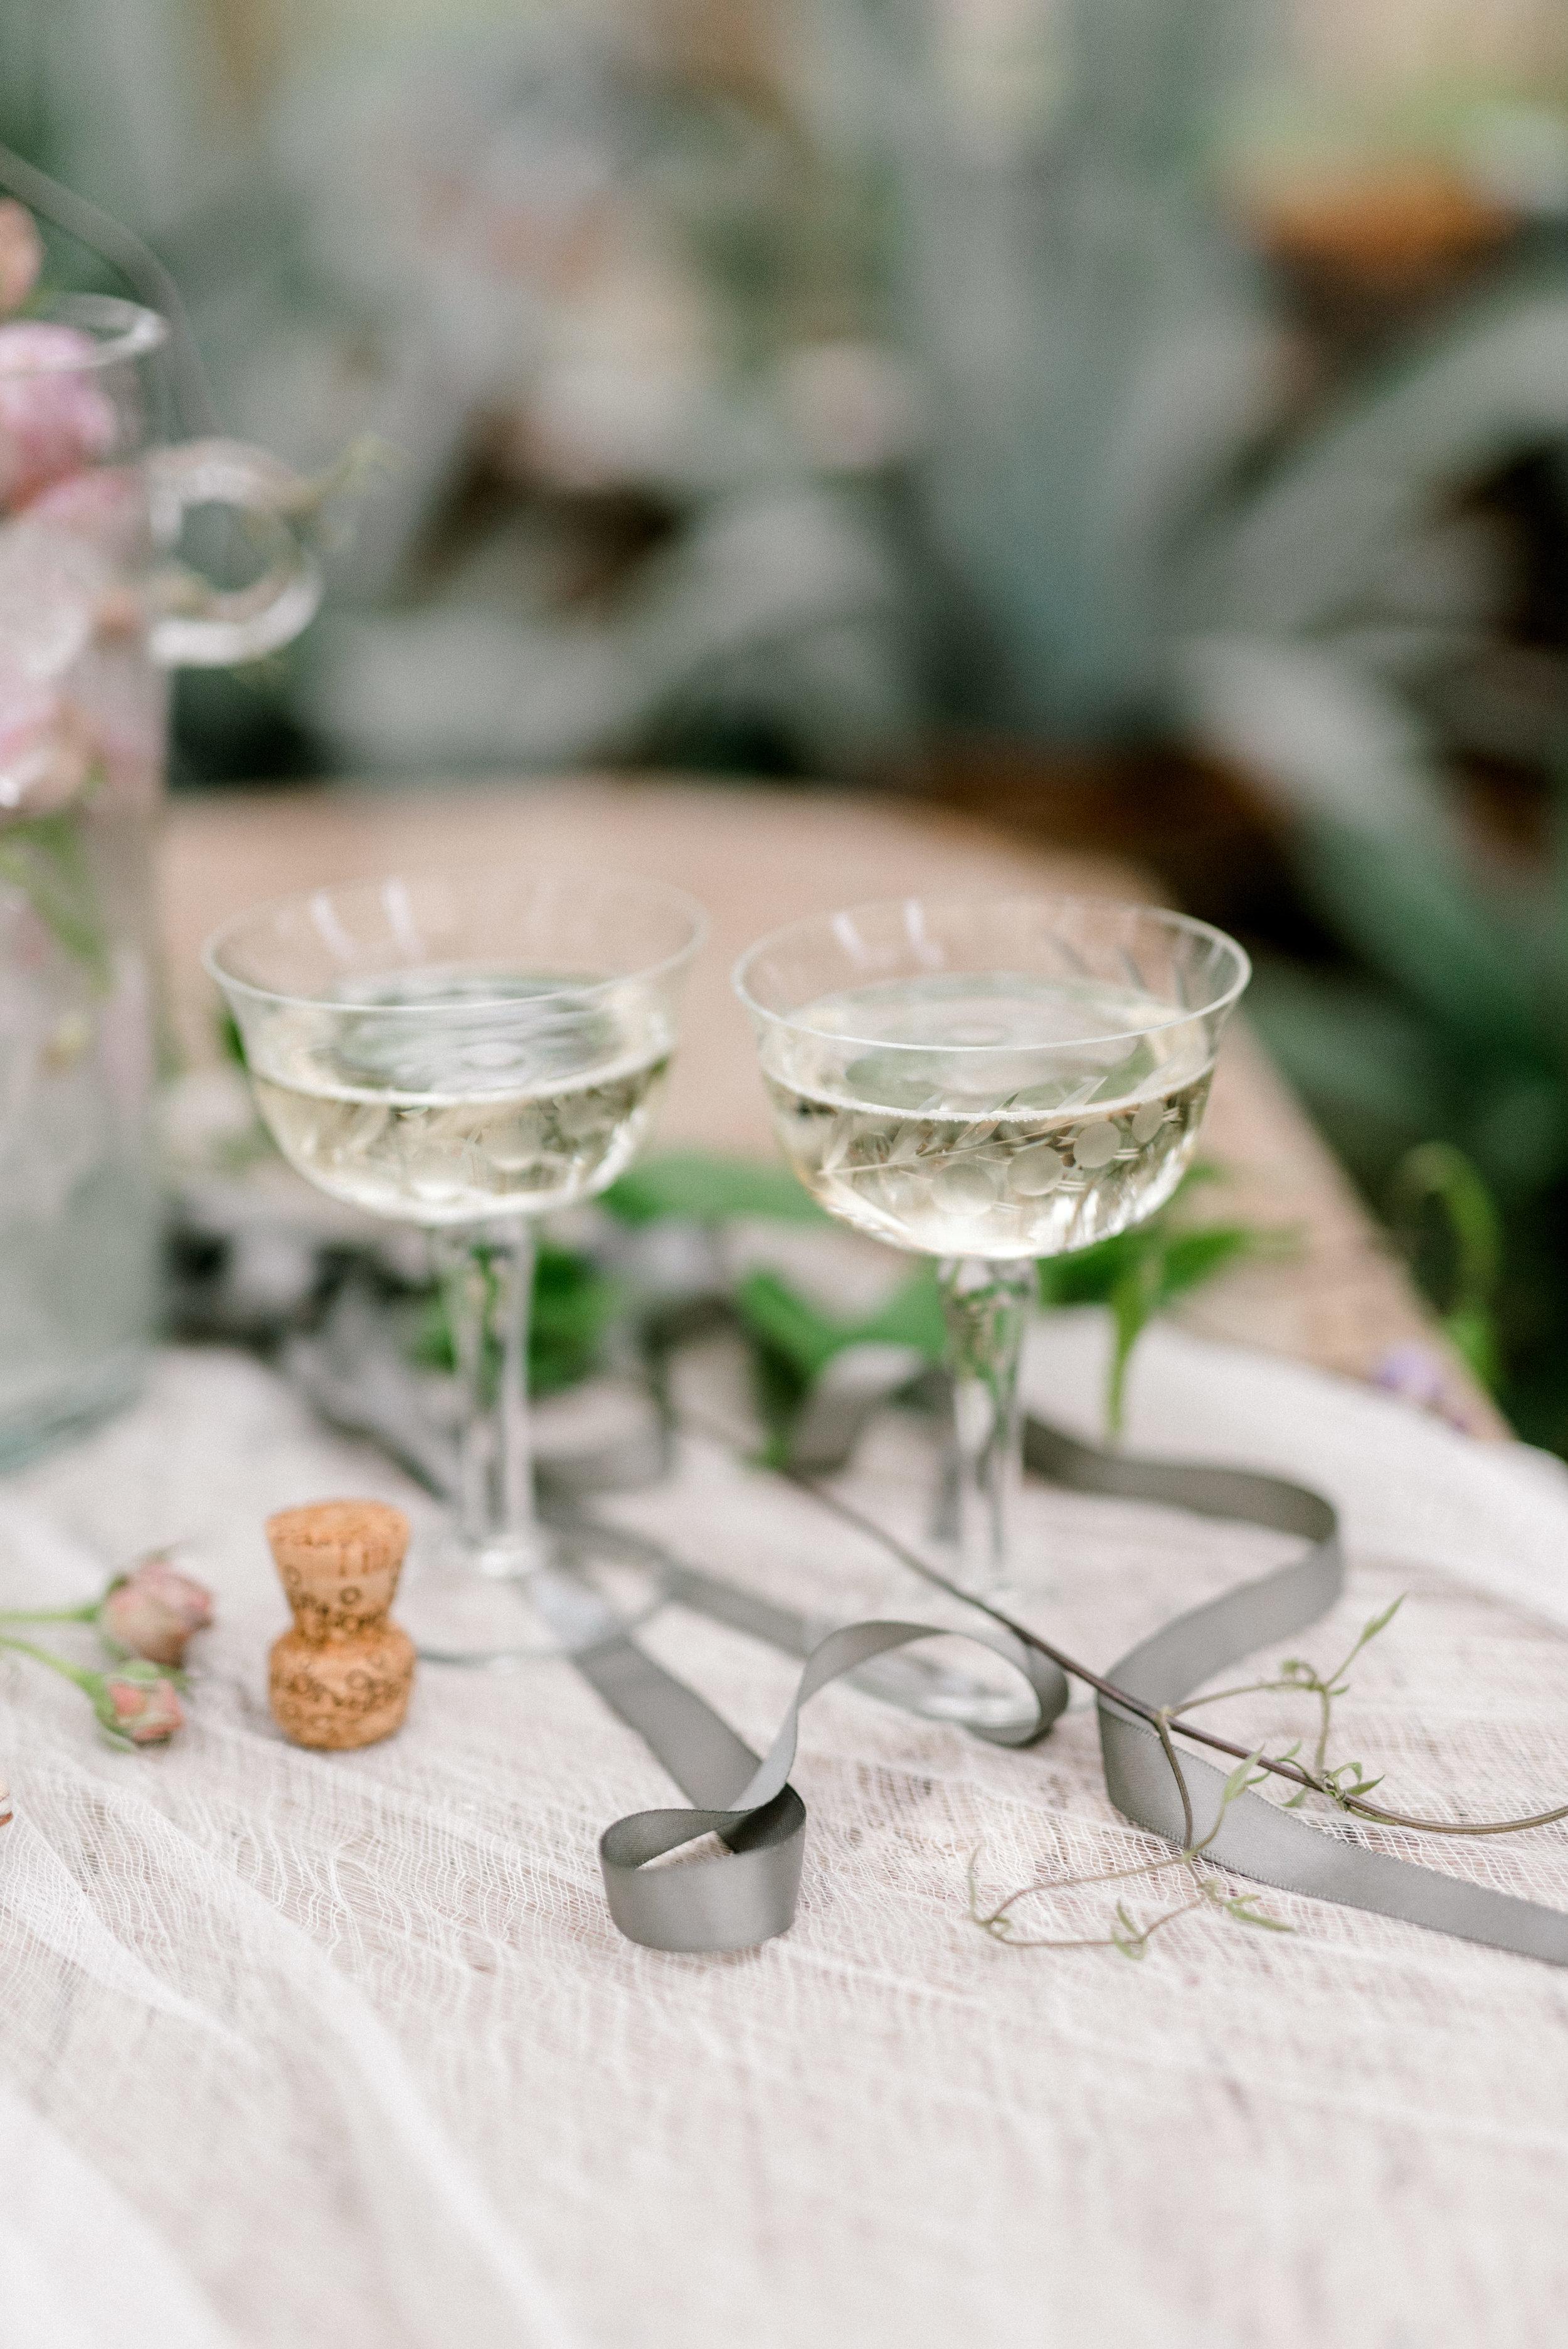 haley-richter-photography-jardin-de-buis-wedding-photos-016.jpg